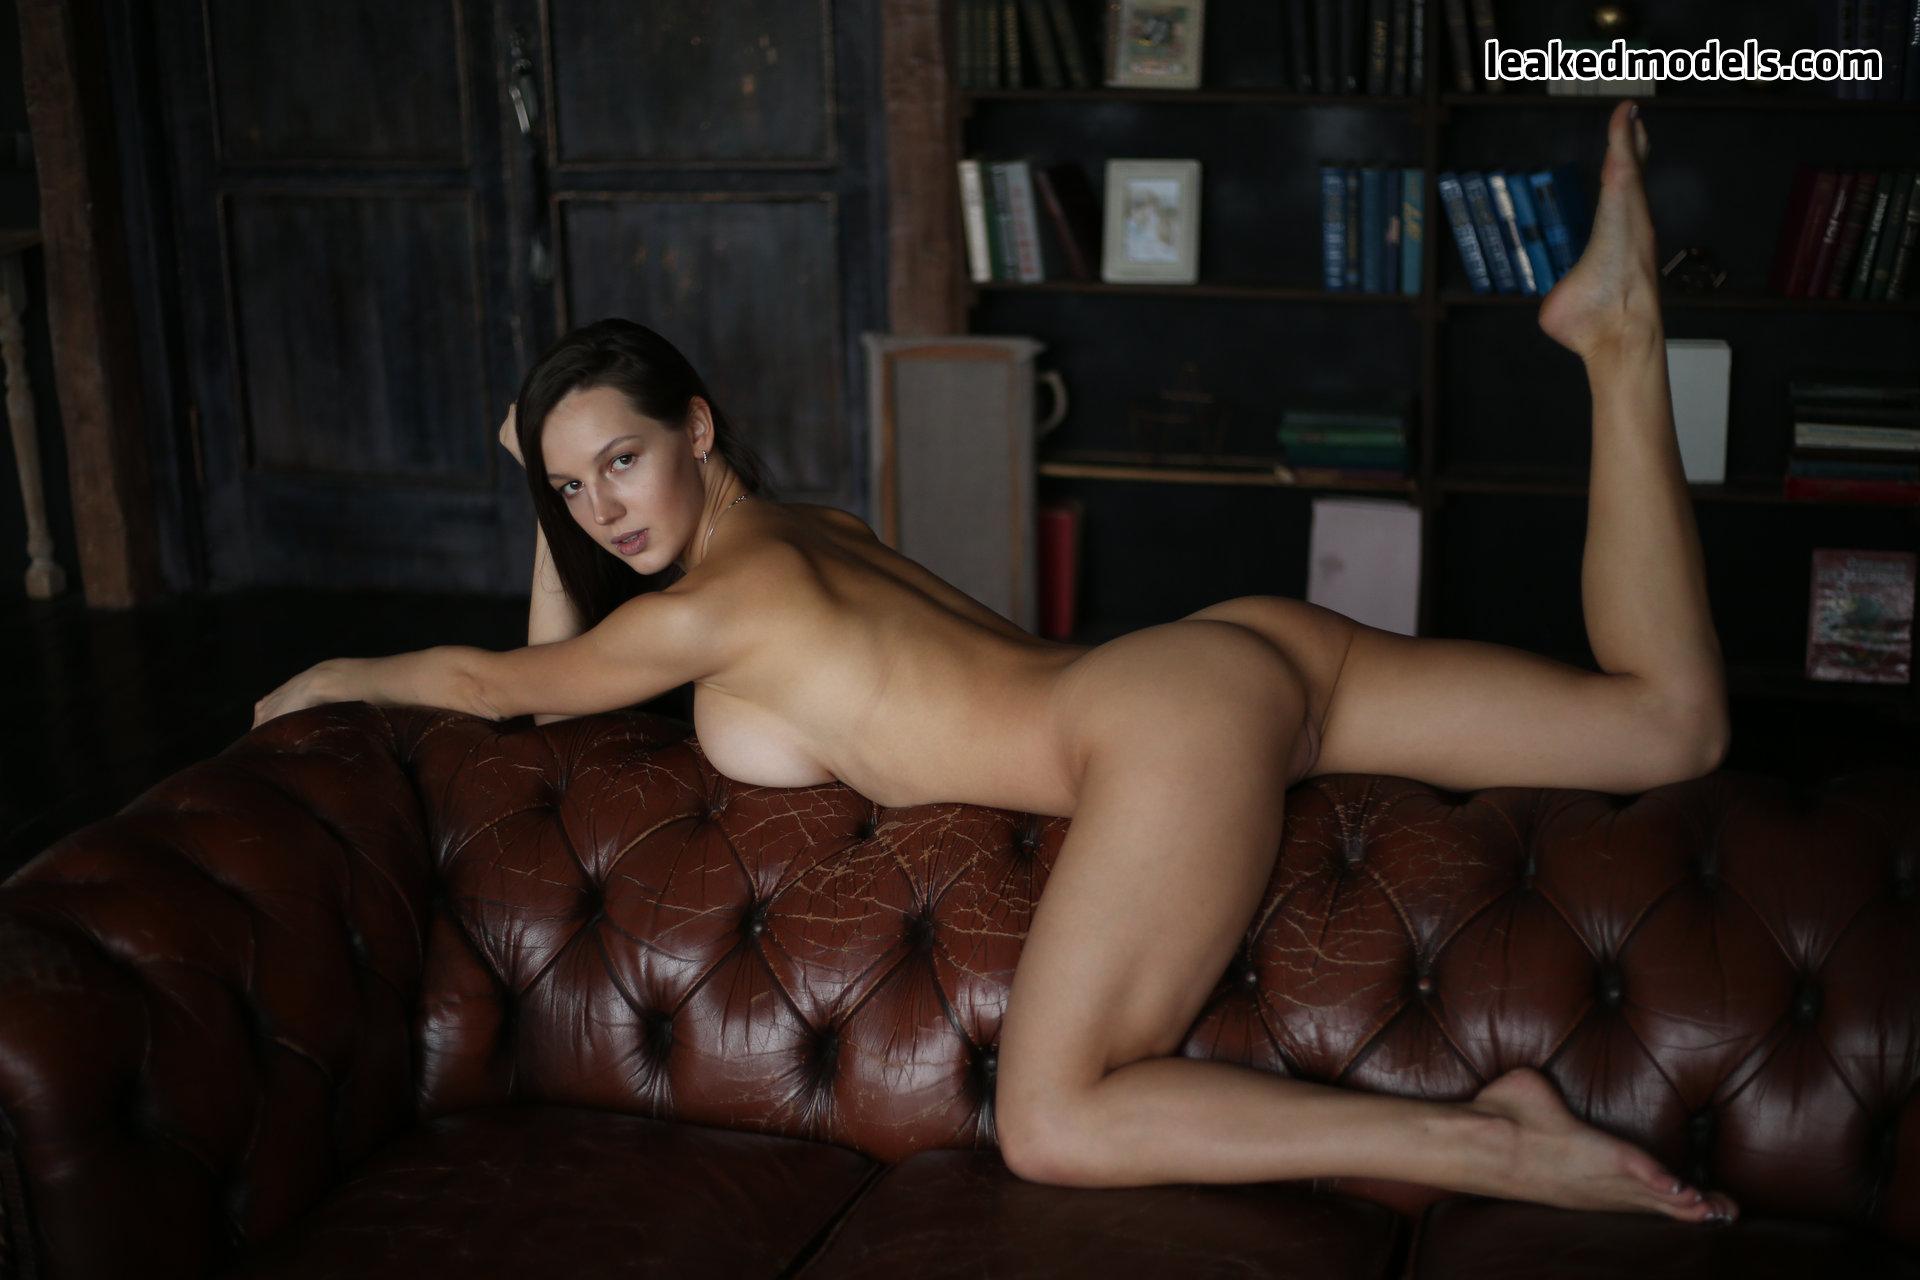 Elena – sweetelena – queenelenaa OnlyFans Nude Leaks (36 Photos)